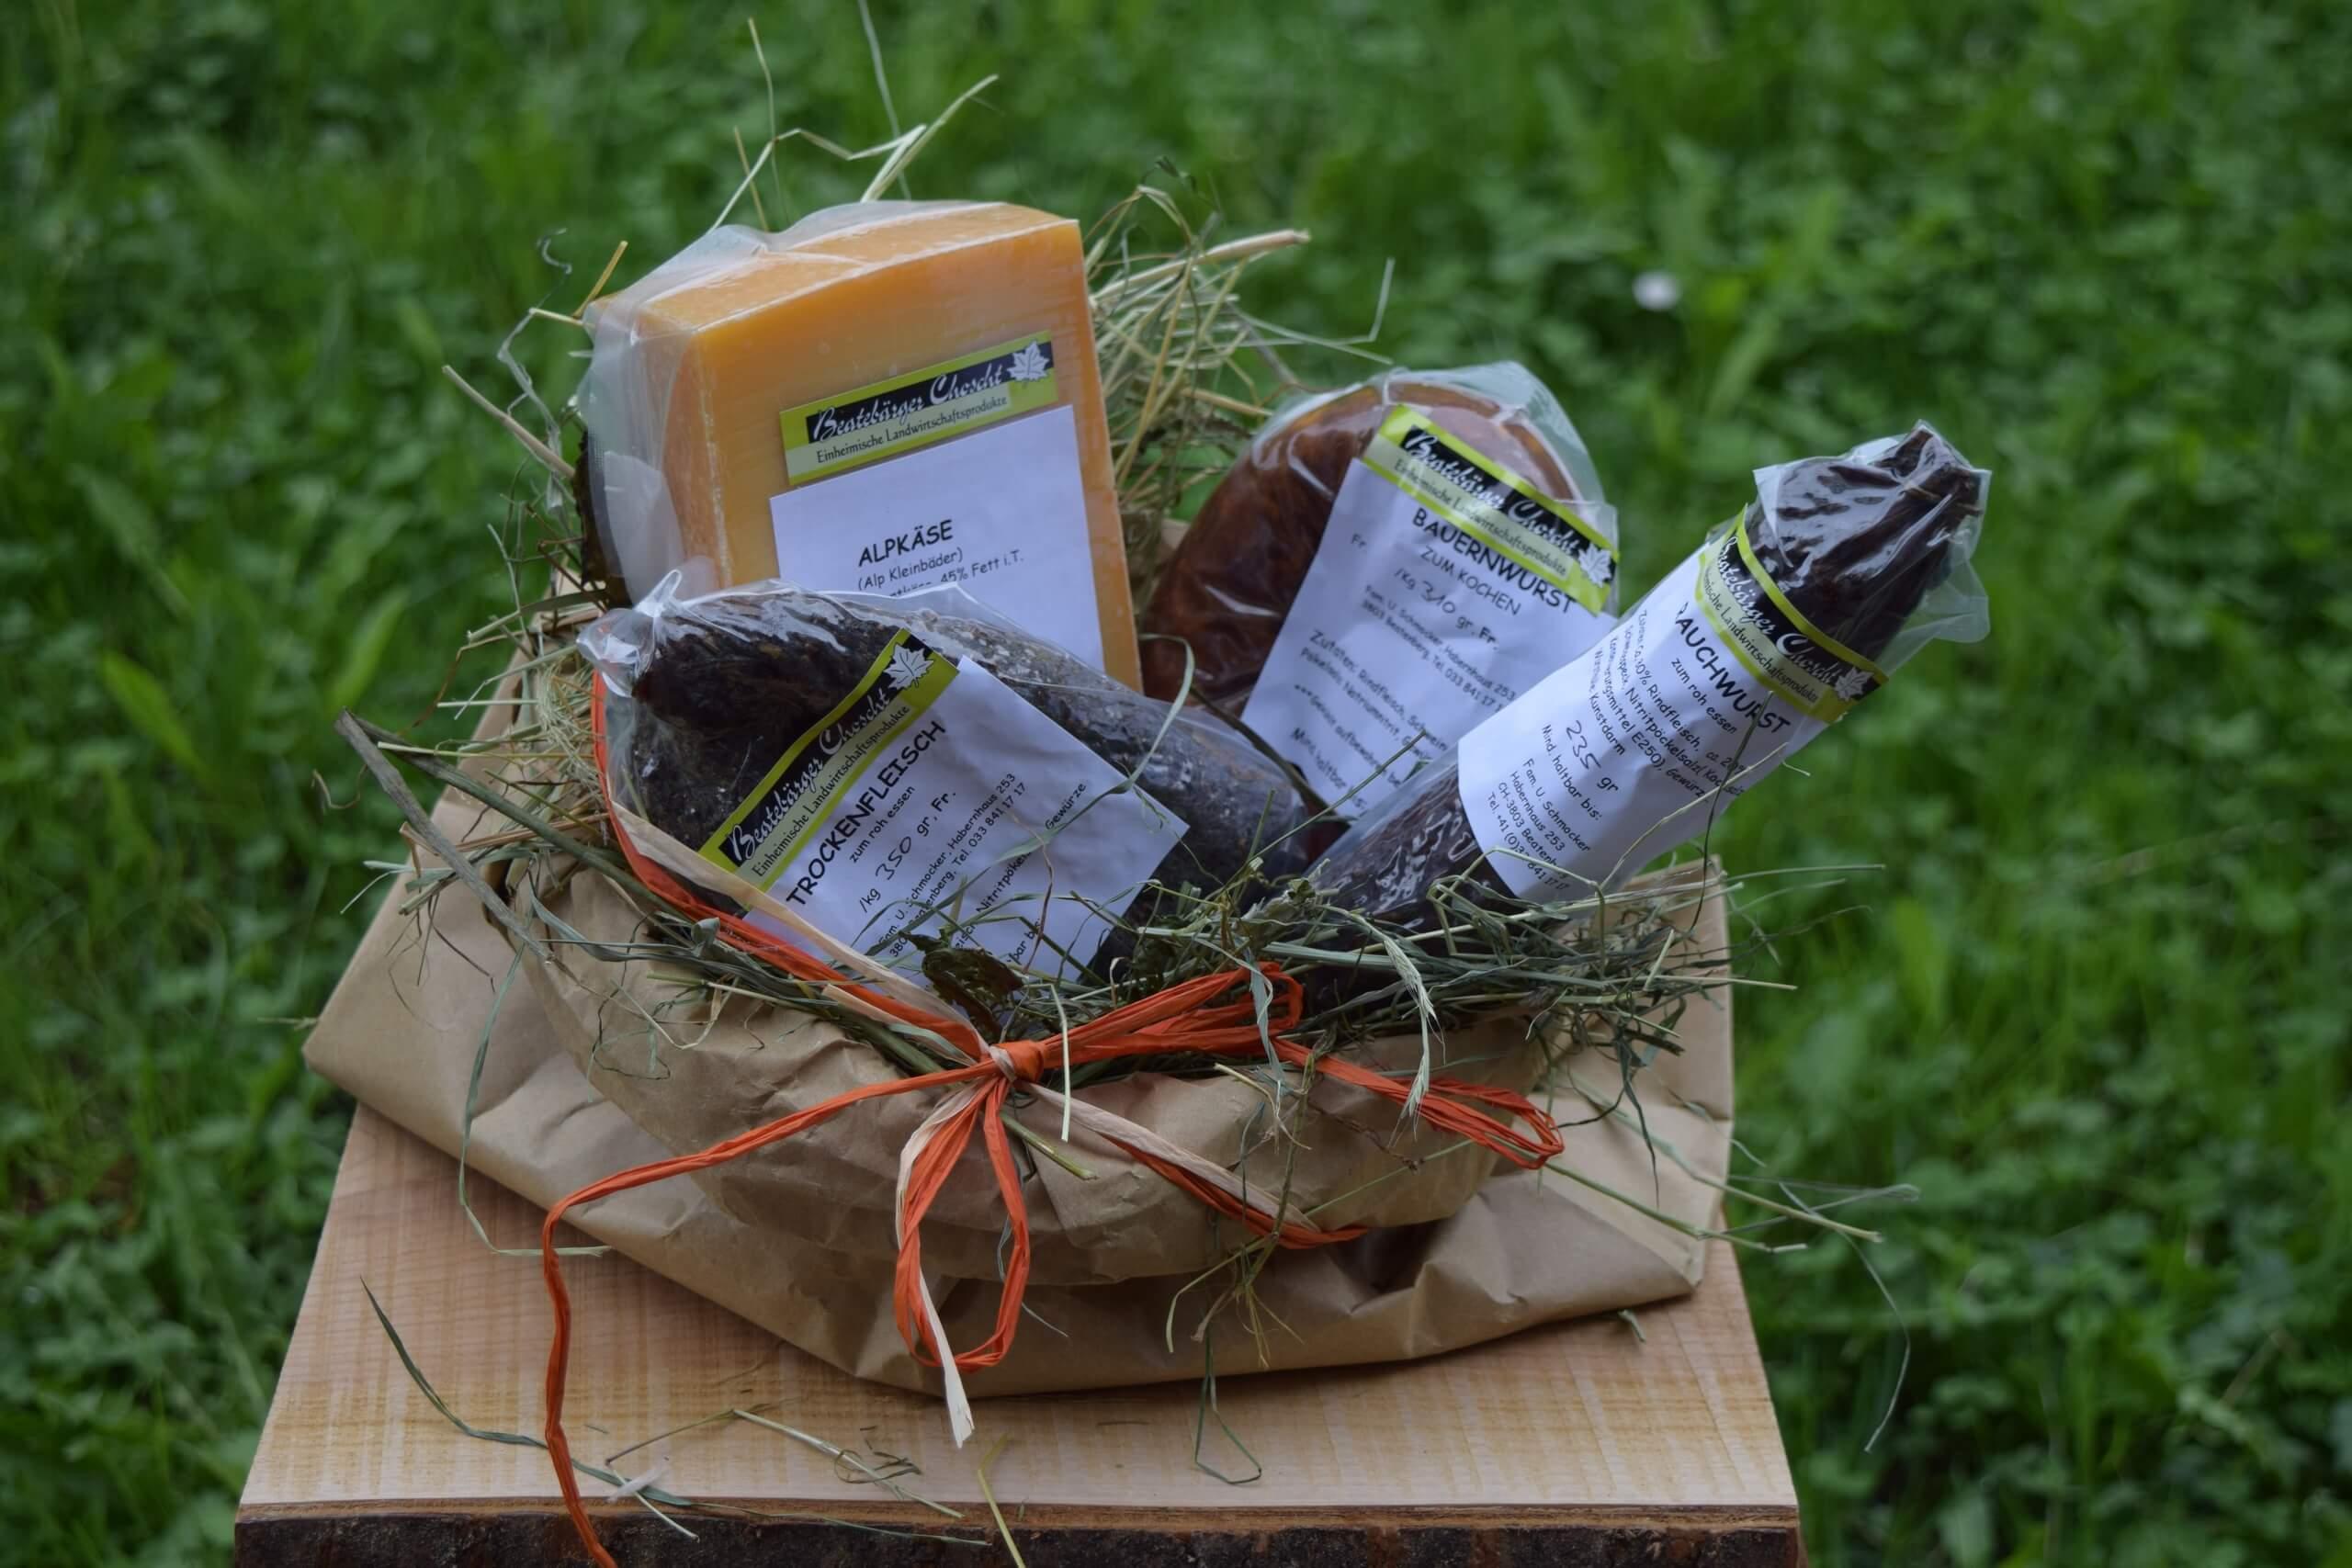 beatenberg-stallvisite-picknick-kaese-wurst